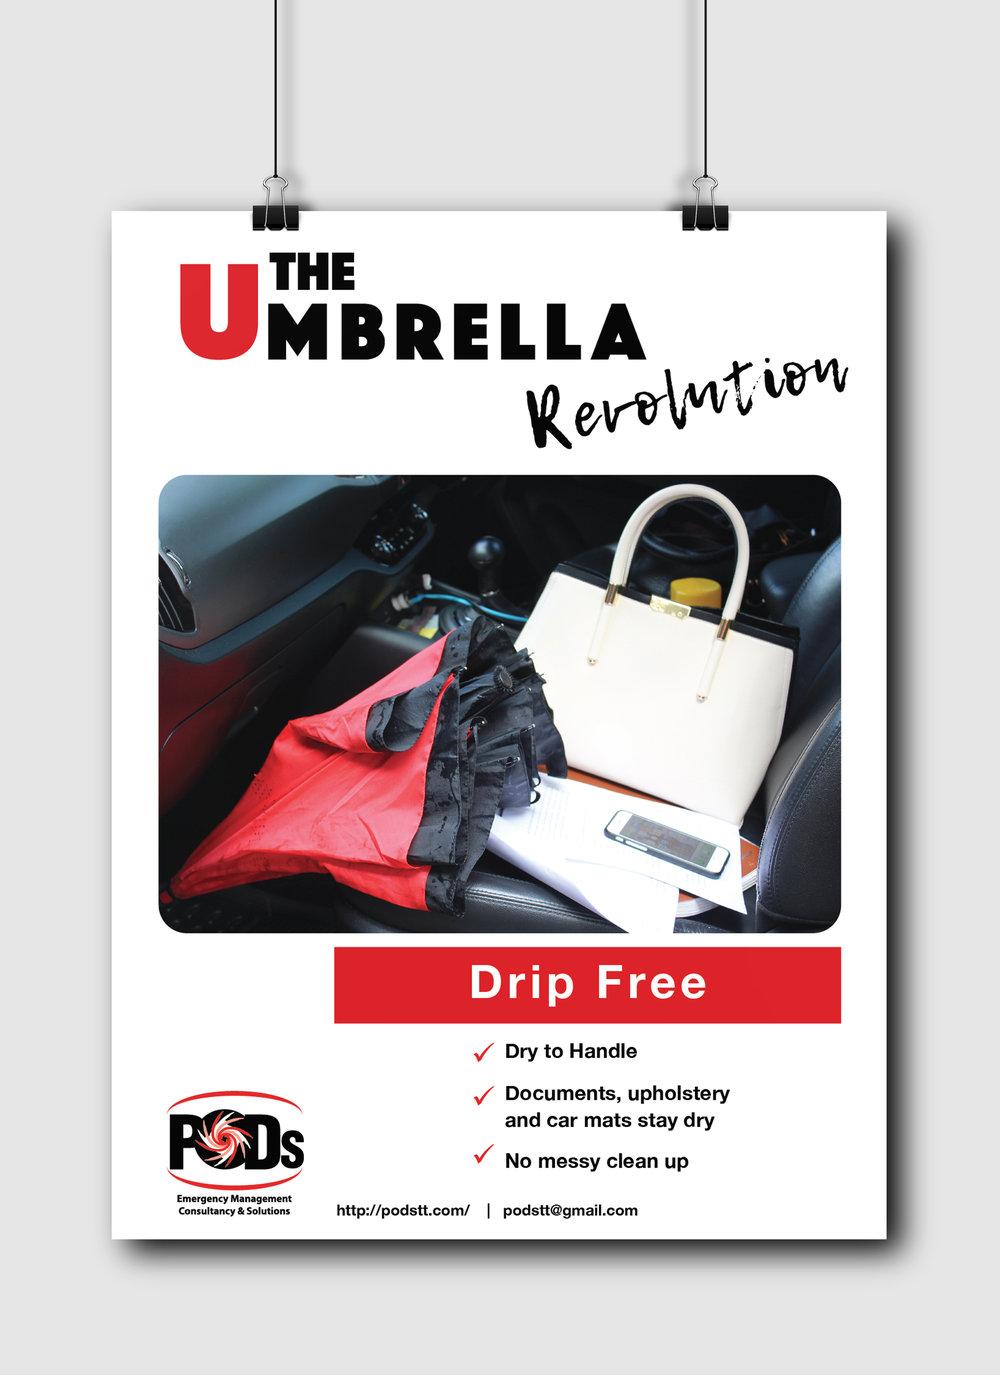 UmbrellaPods_2.jpg